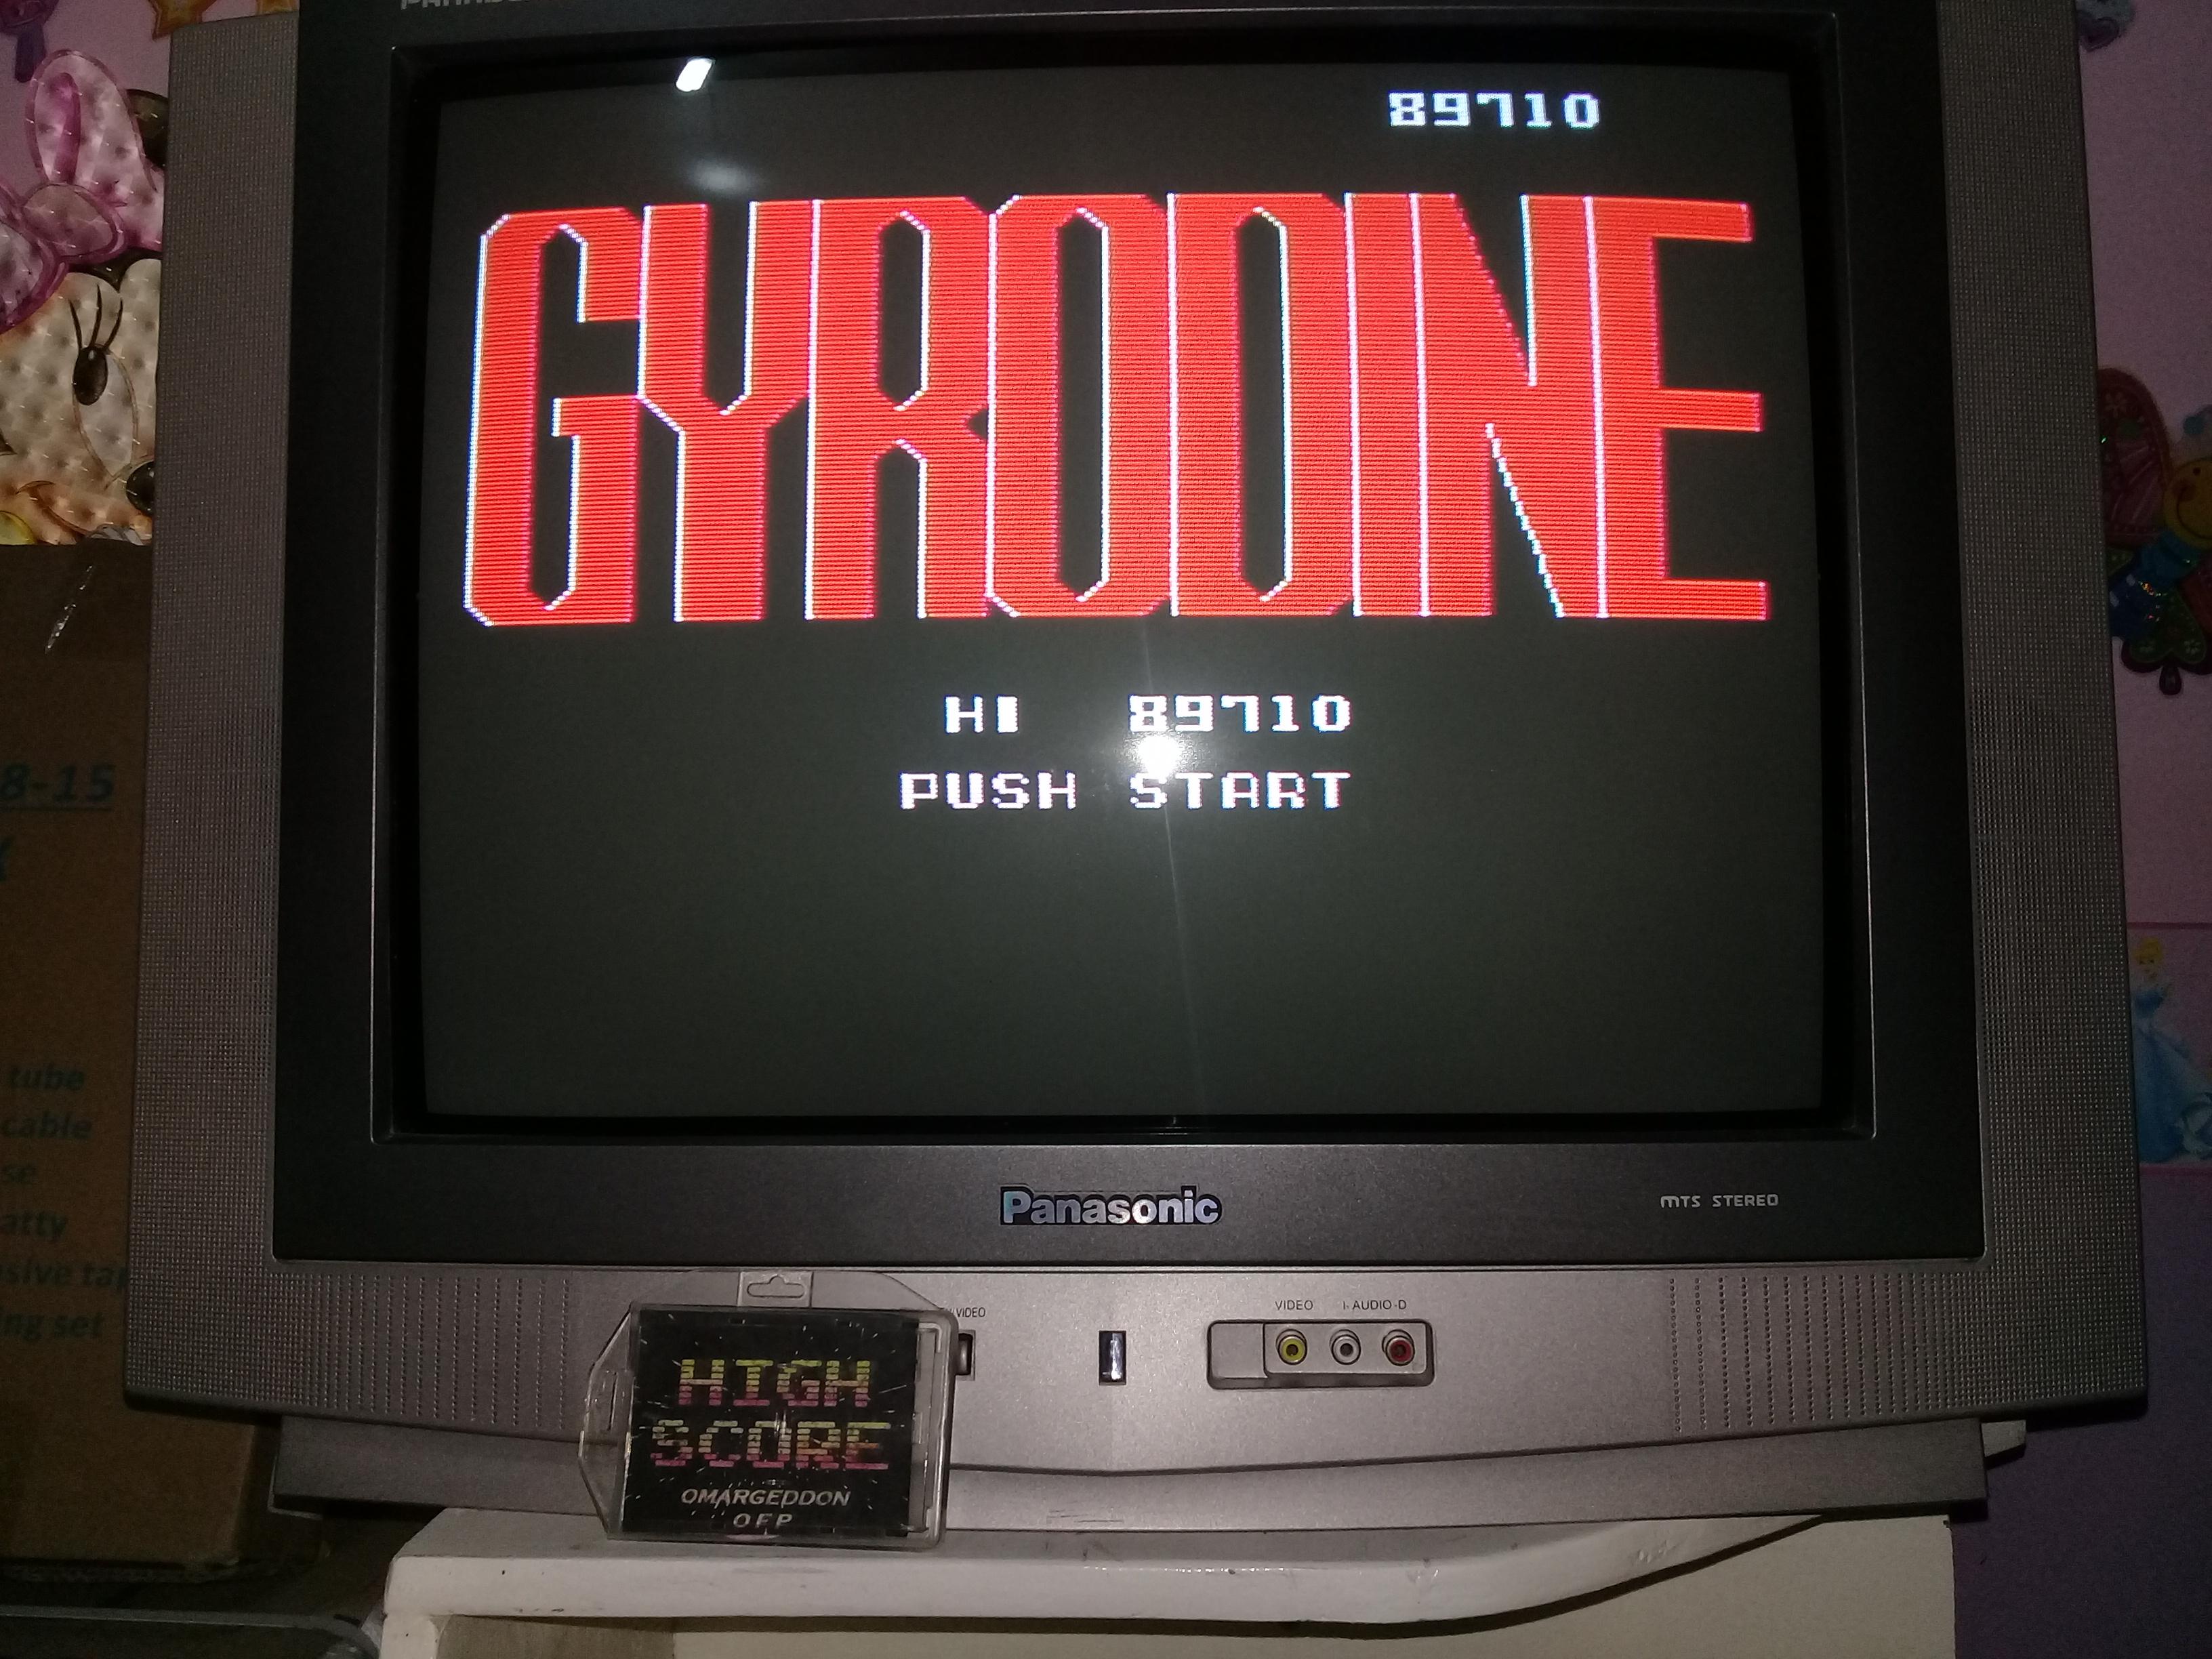 omargeddon: Gyrodine (NES/Famicom) 89,710 points on 2019-03-25 20:51:02